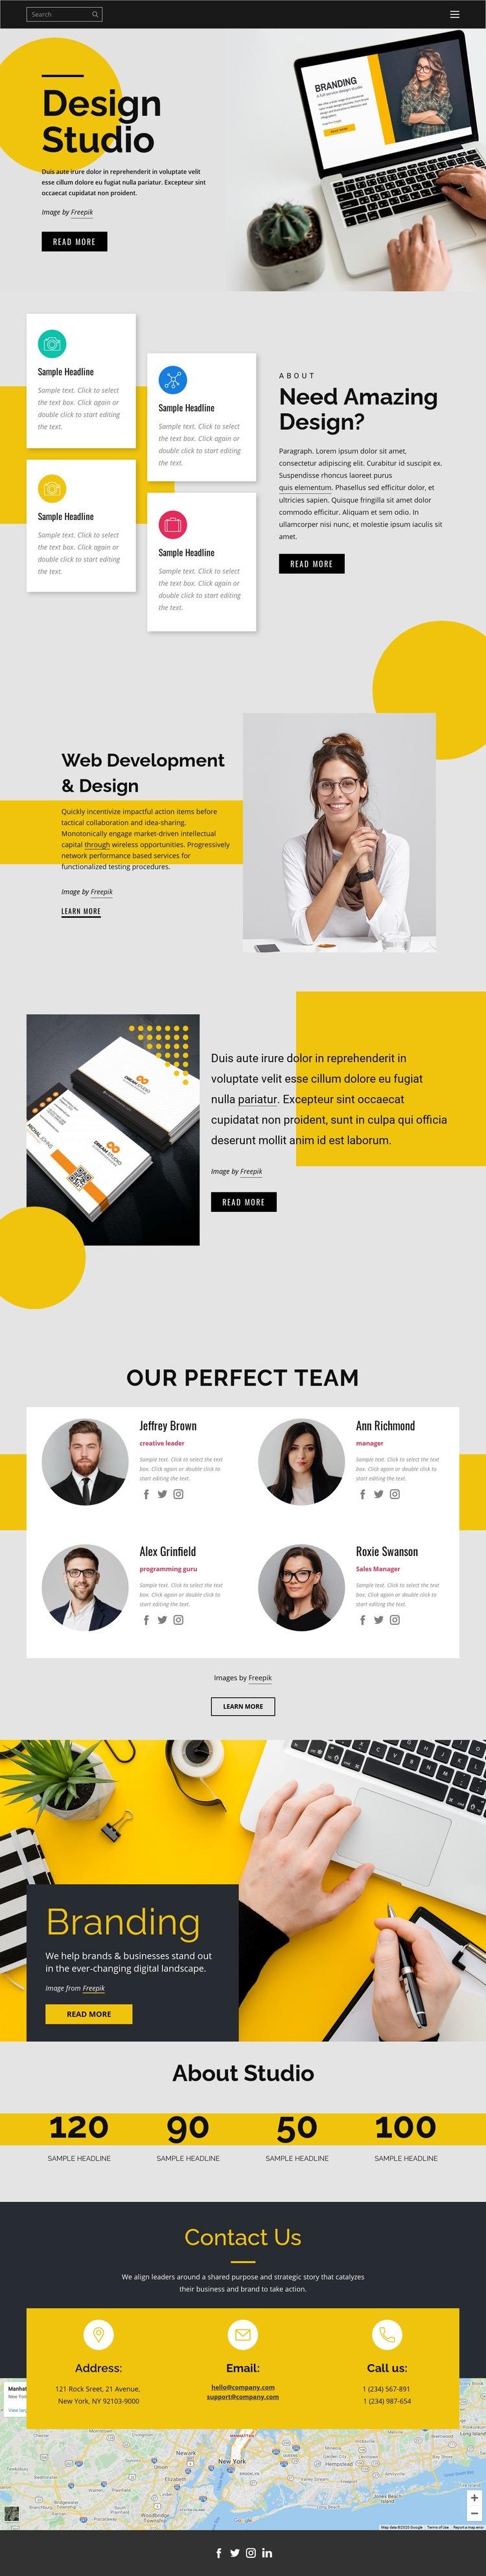 Brand, print & web design Html Code Example